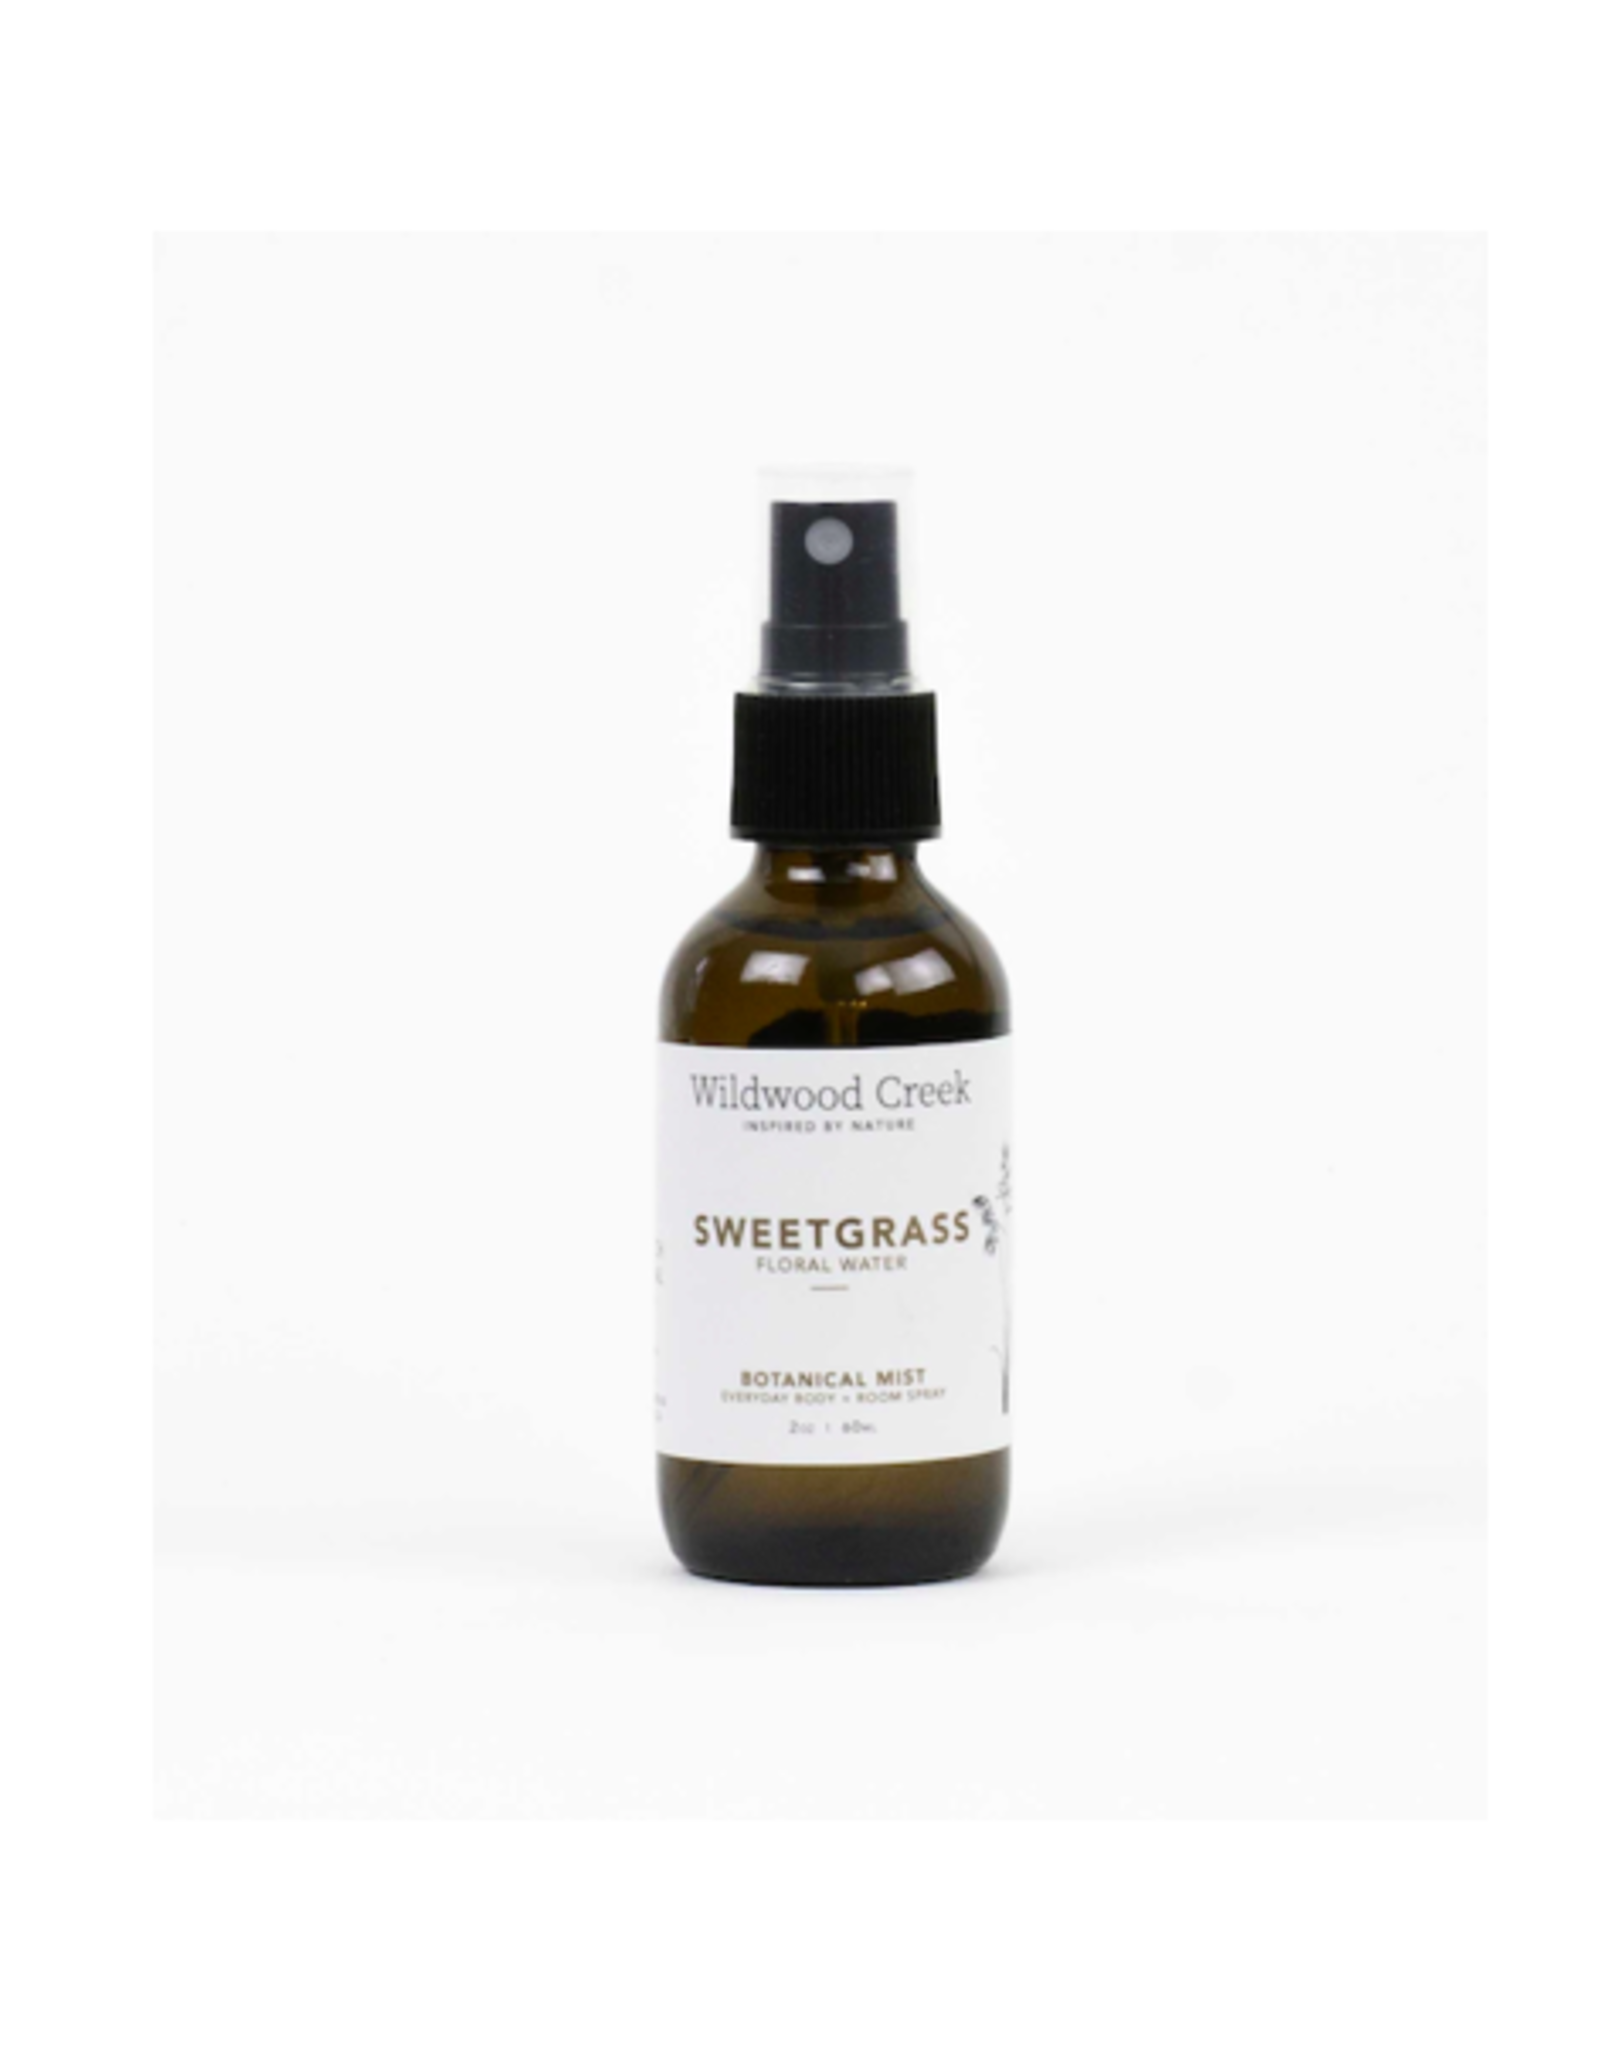 Wildwood Creek - Mist/Sweetgrass 2oz